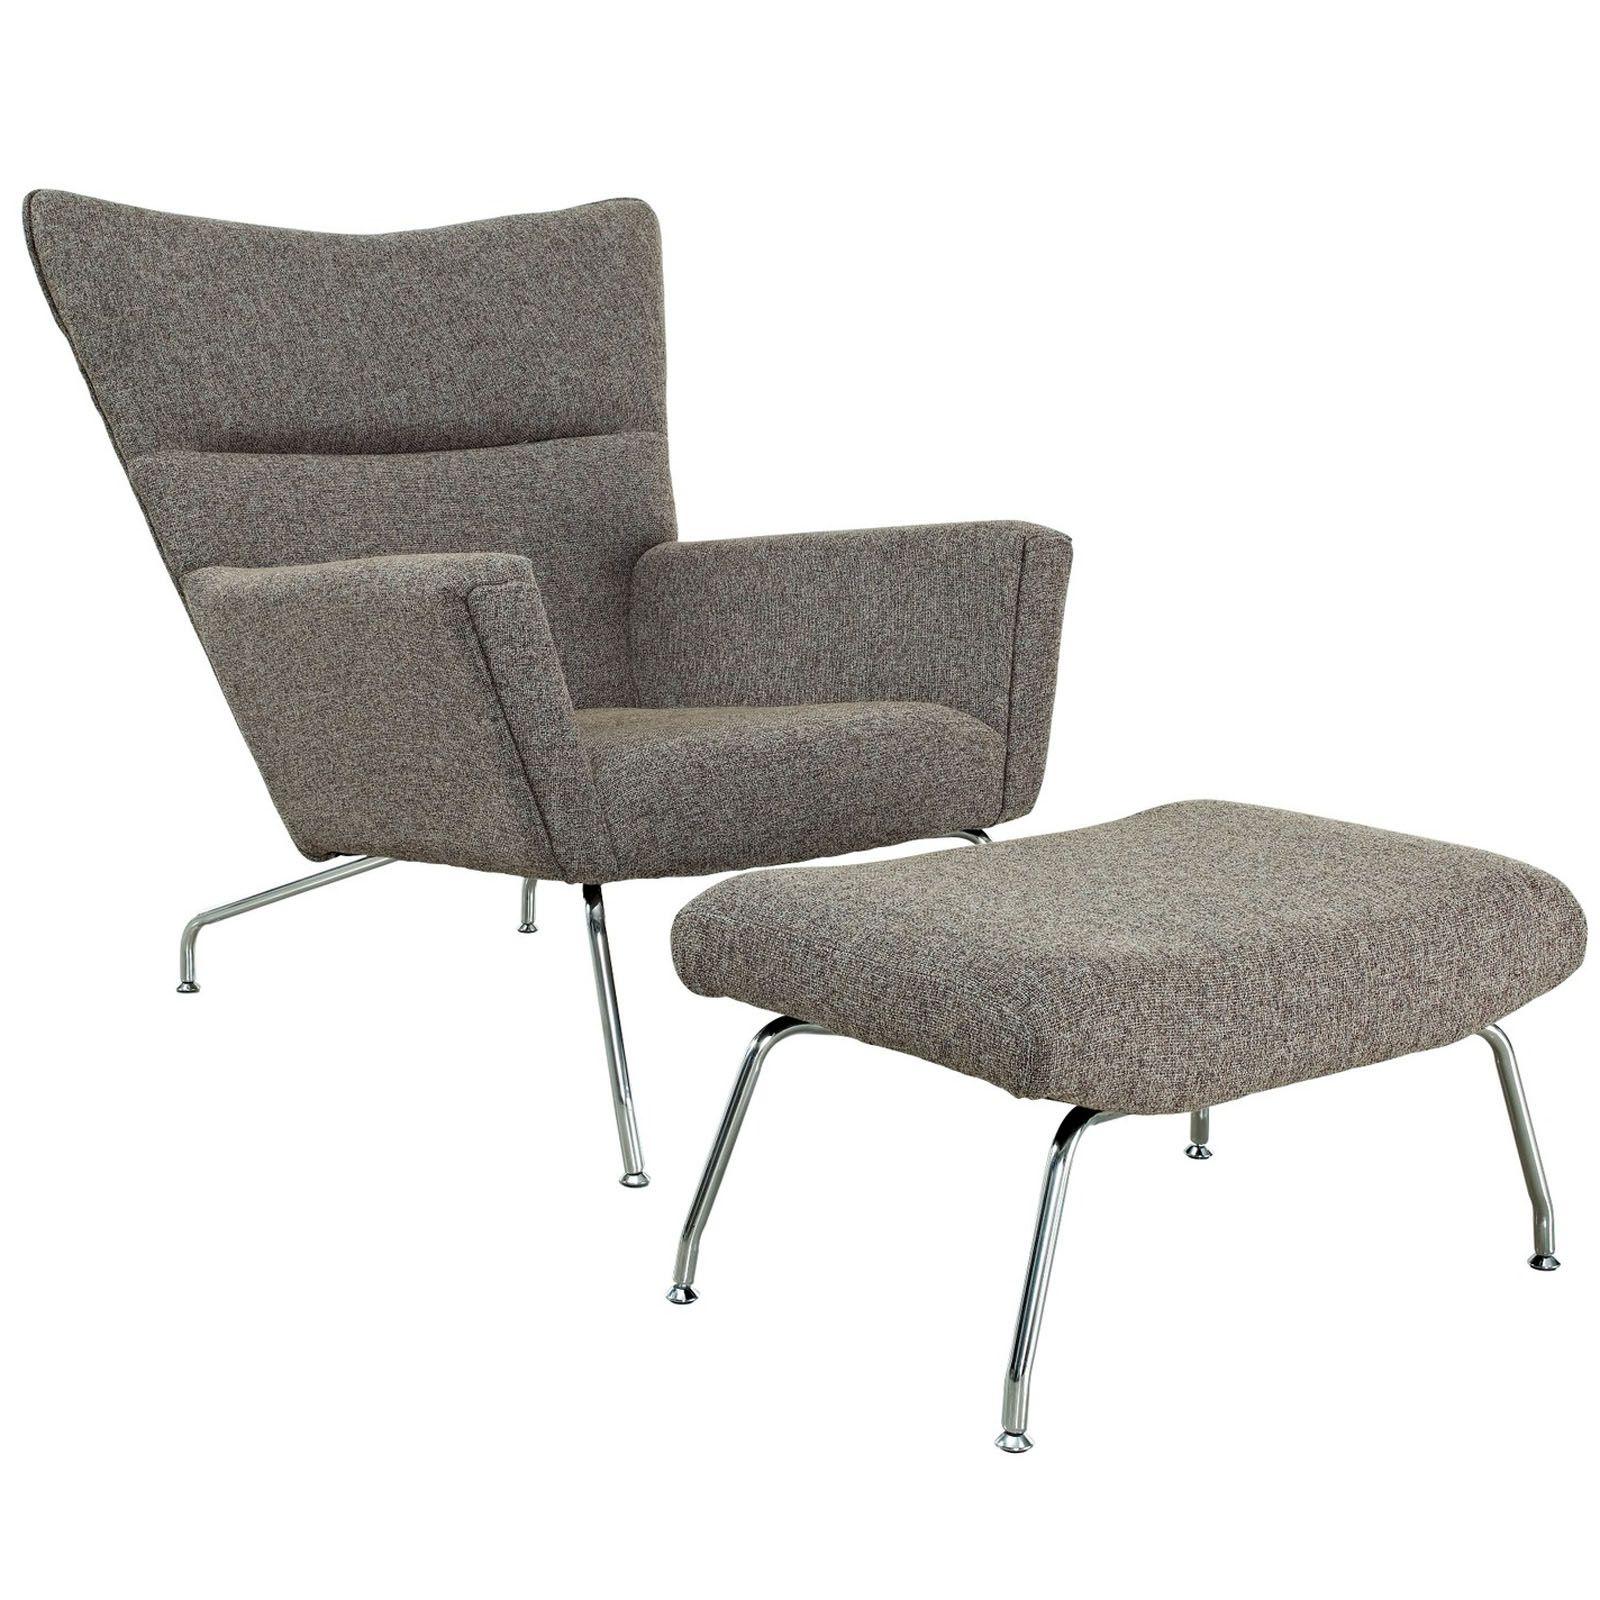 Great Futuristic Lounge Chair U0026 Ottoman Set   Oatmeal | Dotandbo.com  #DotandBoAutumn